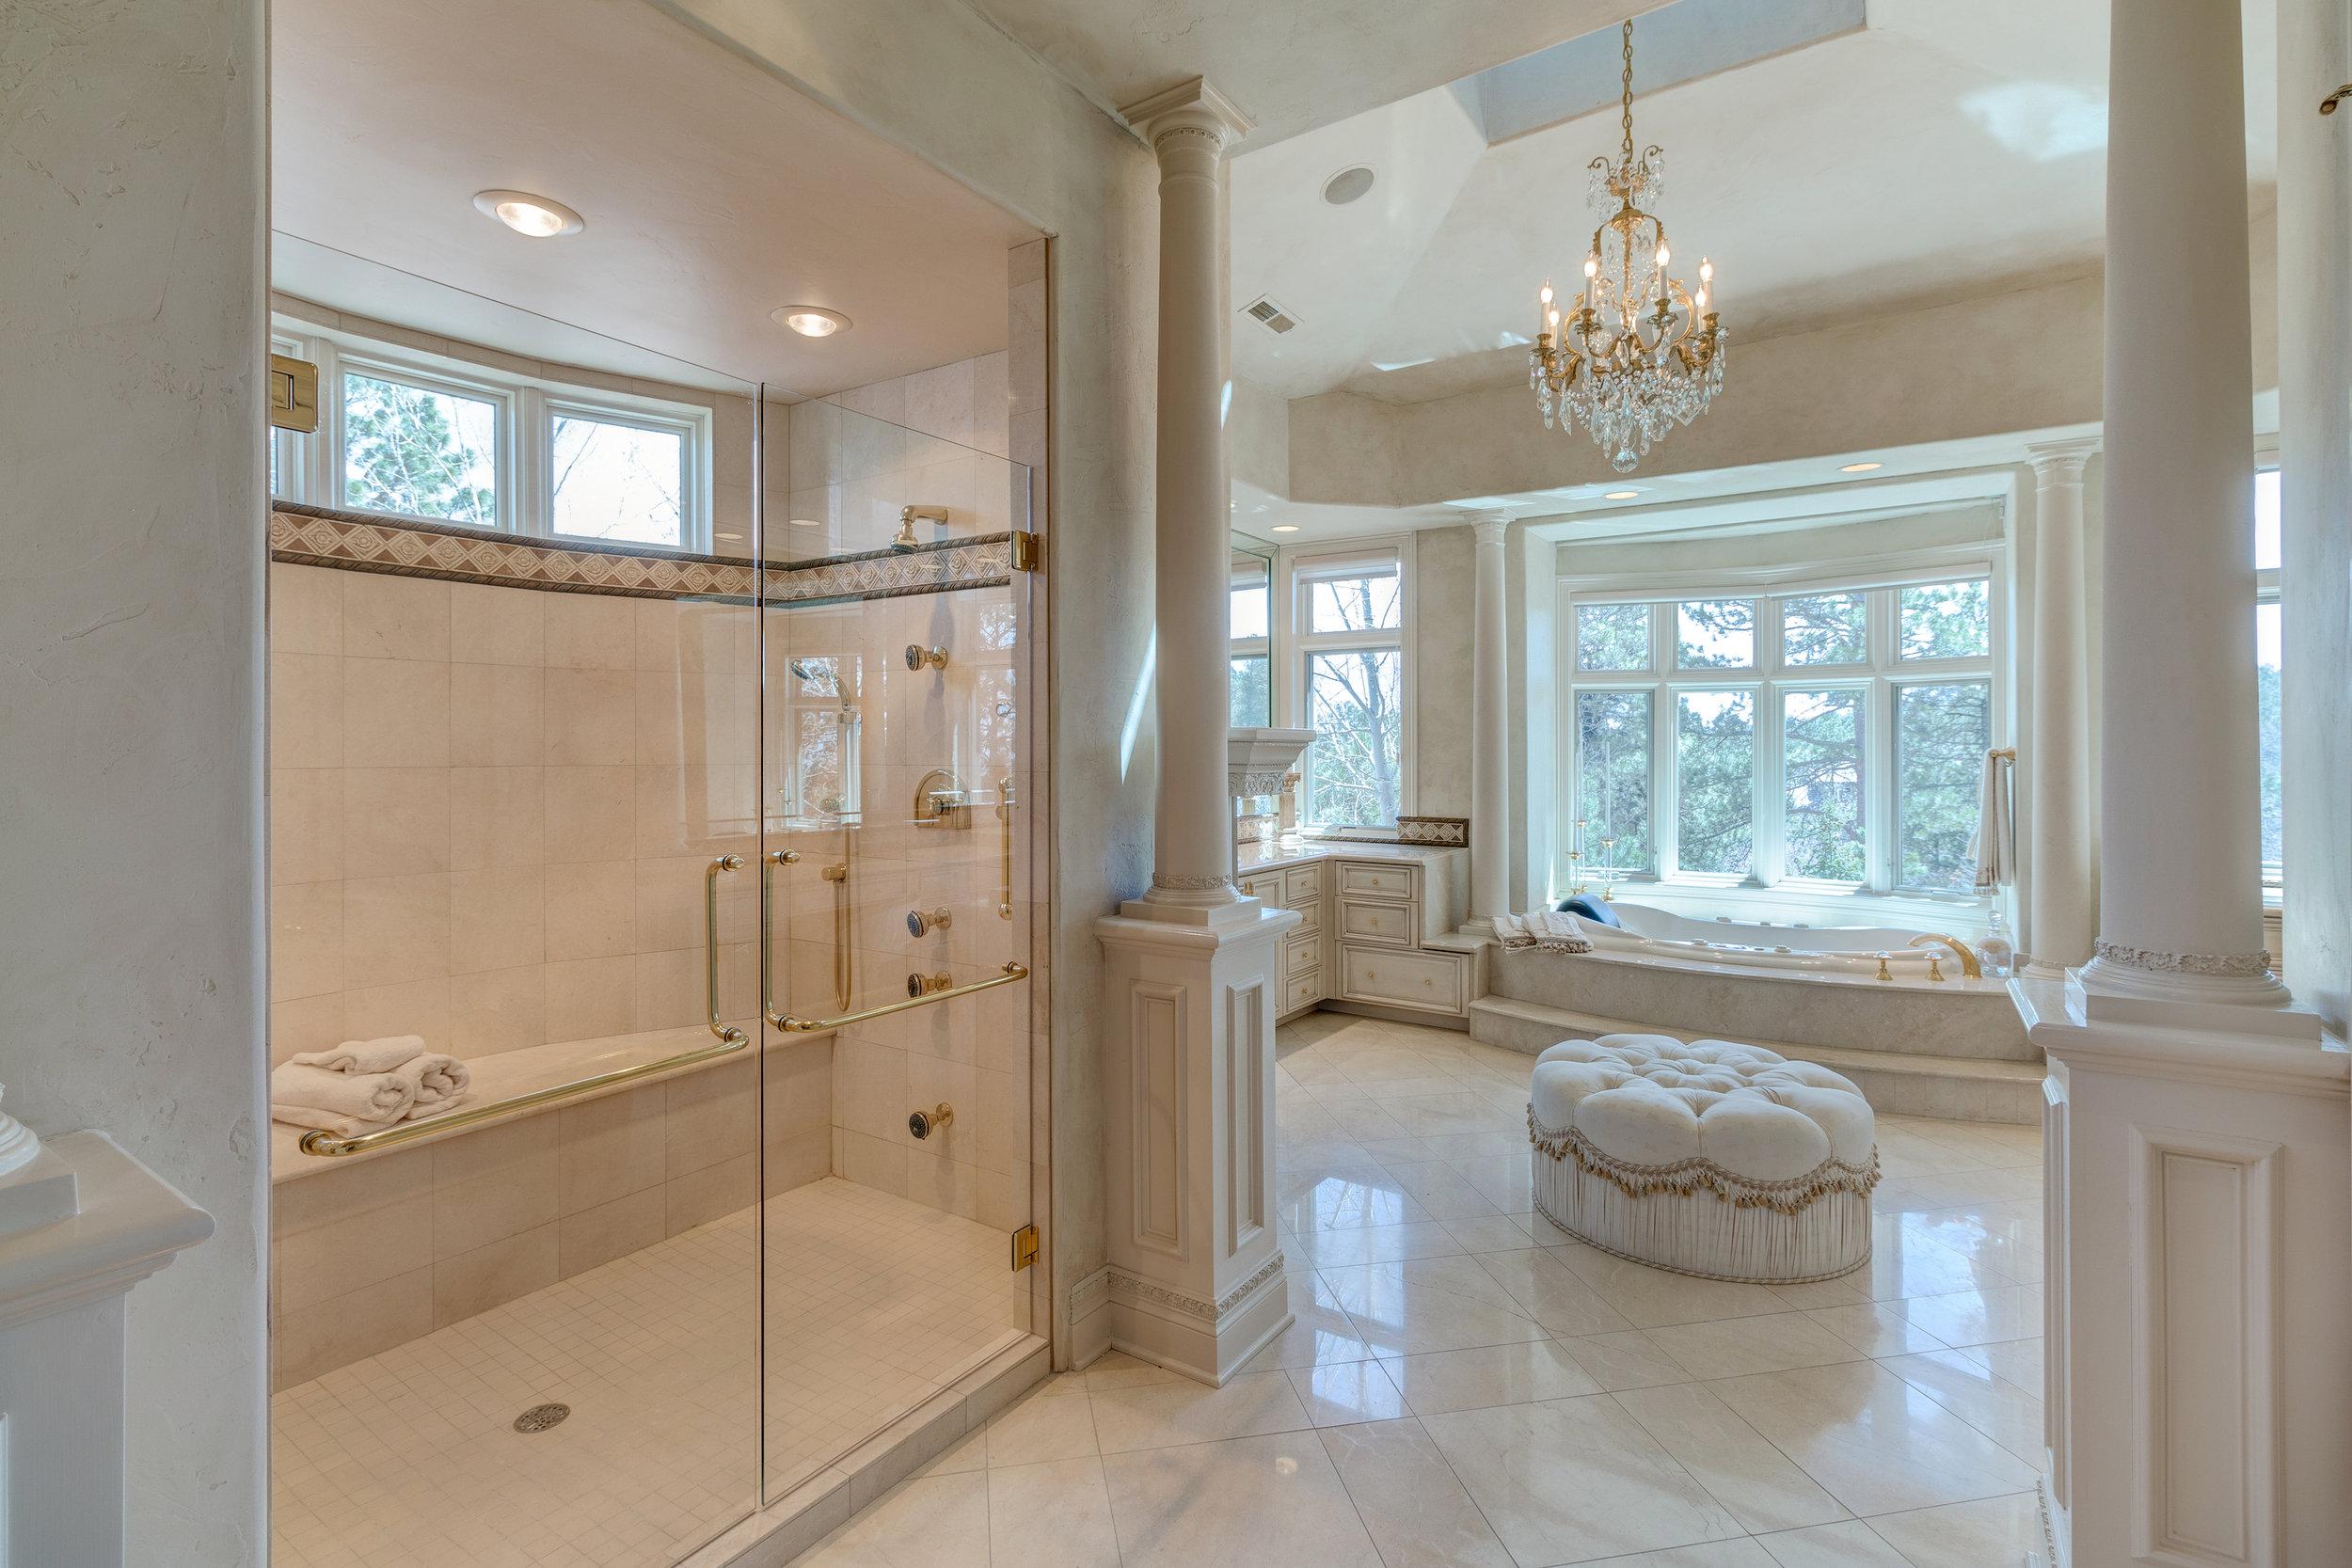 14-Spa bathroom with massive shower.jpg